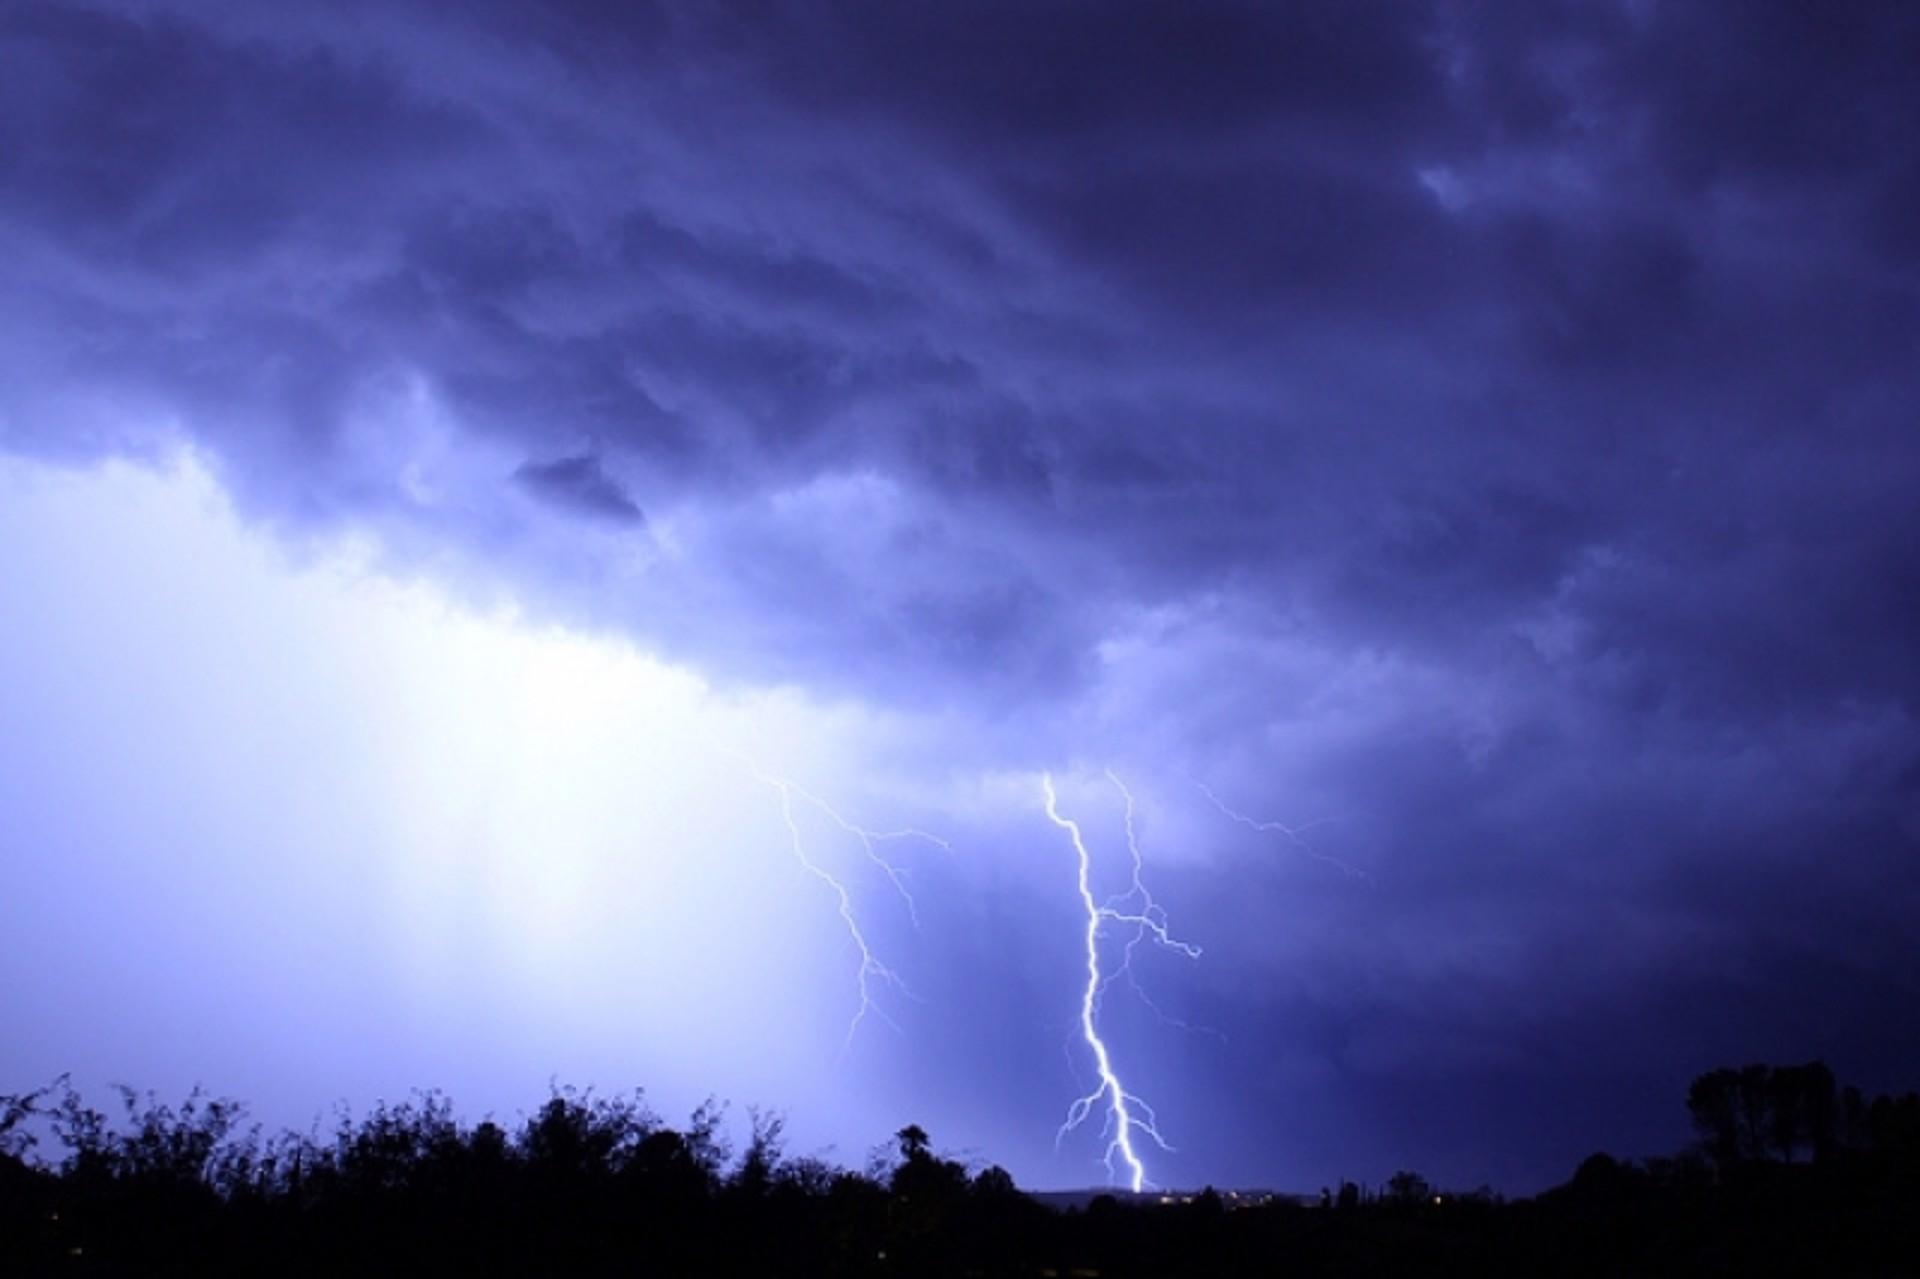 Rain & Lightning by John Hays